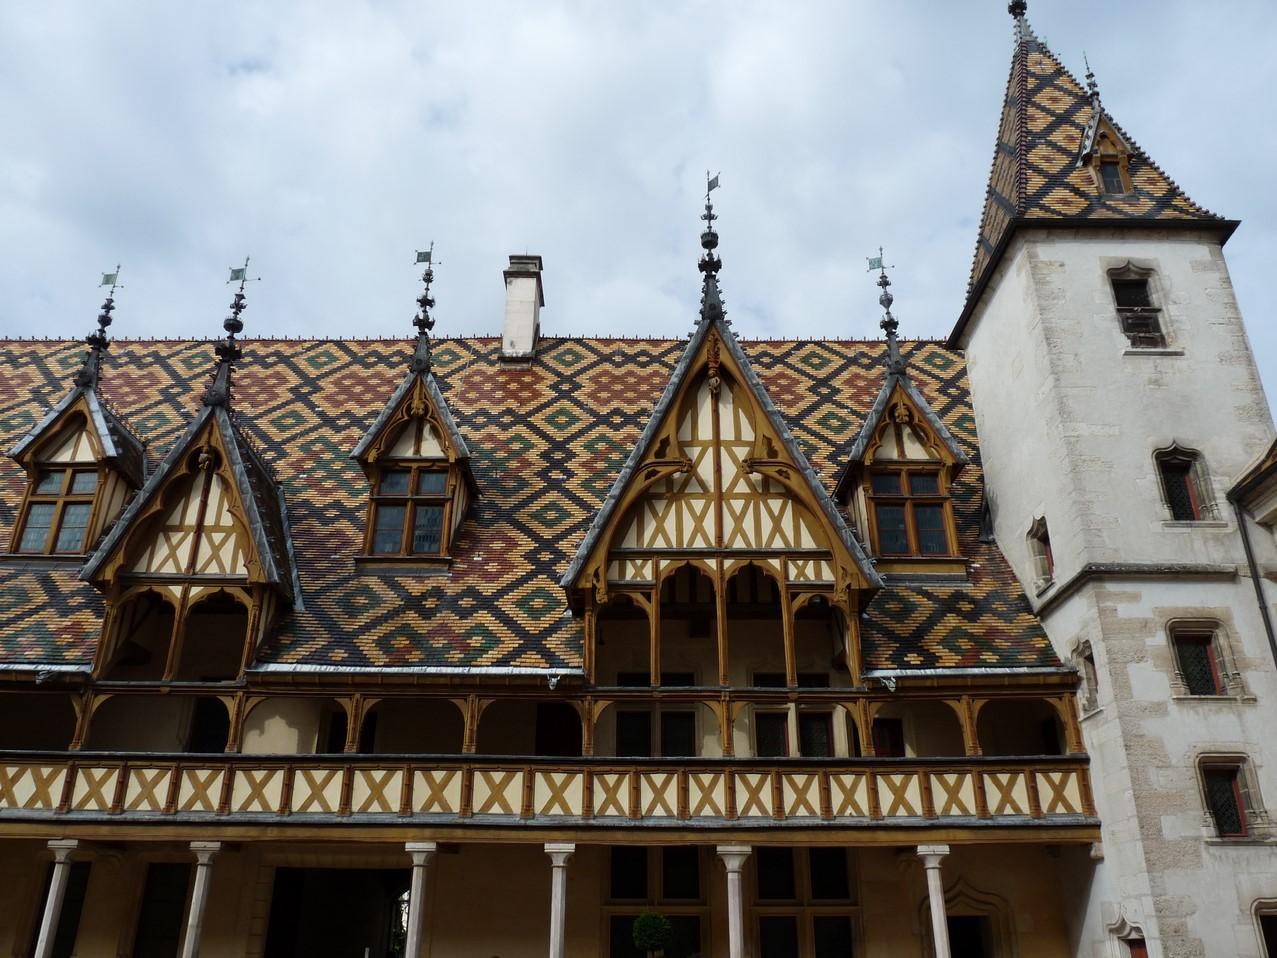 Hôtel Dieu à Beaune